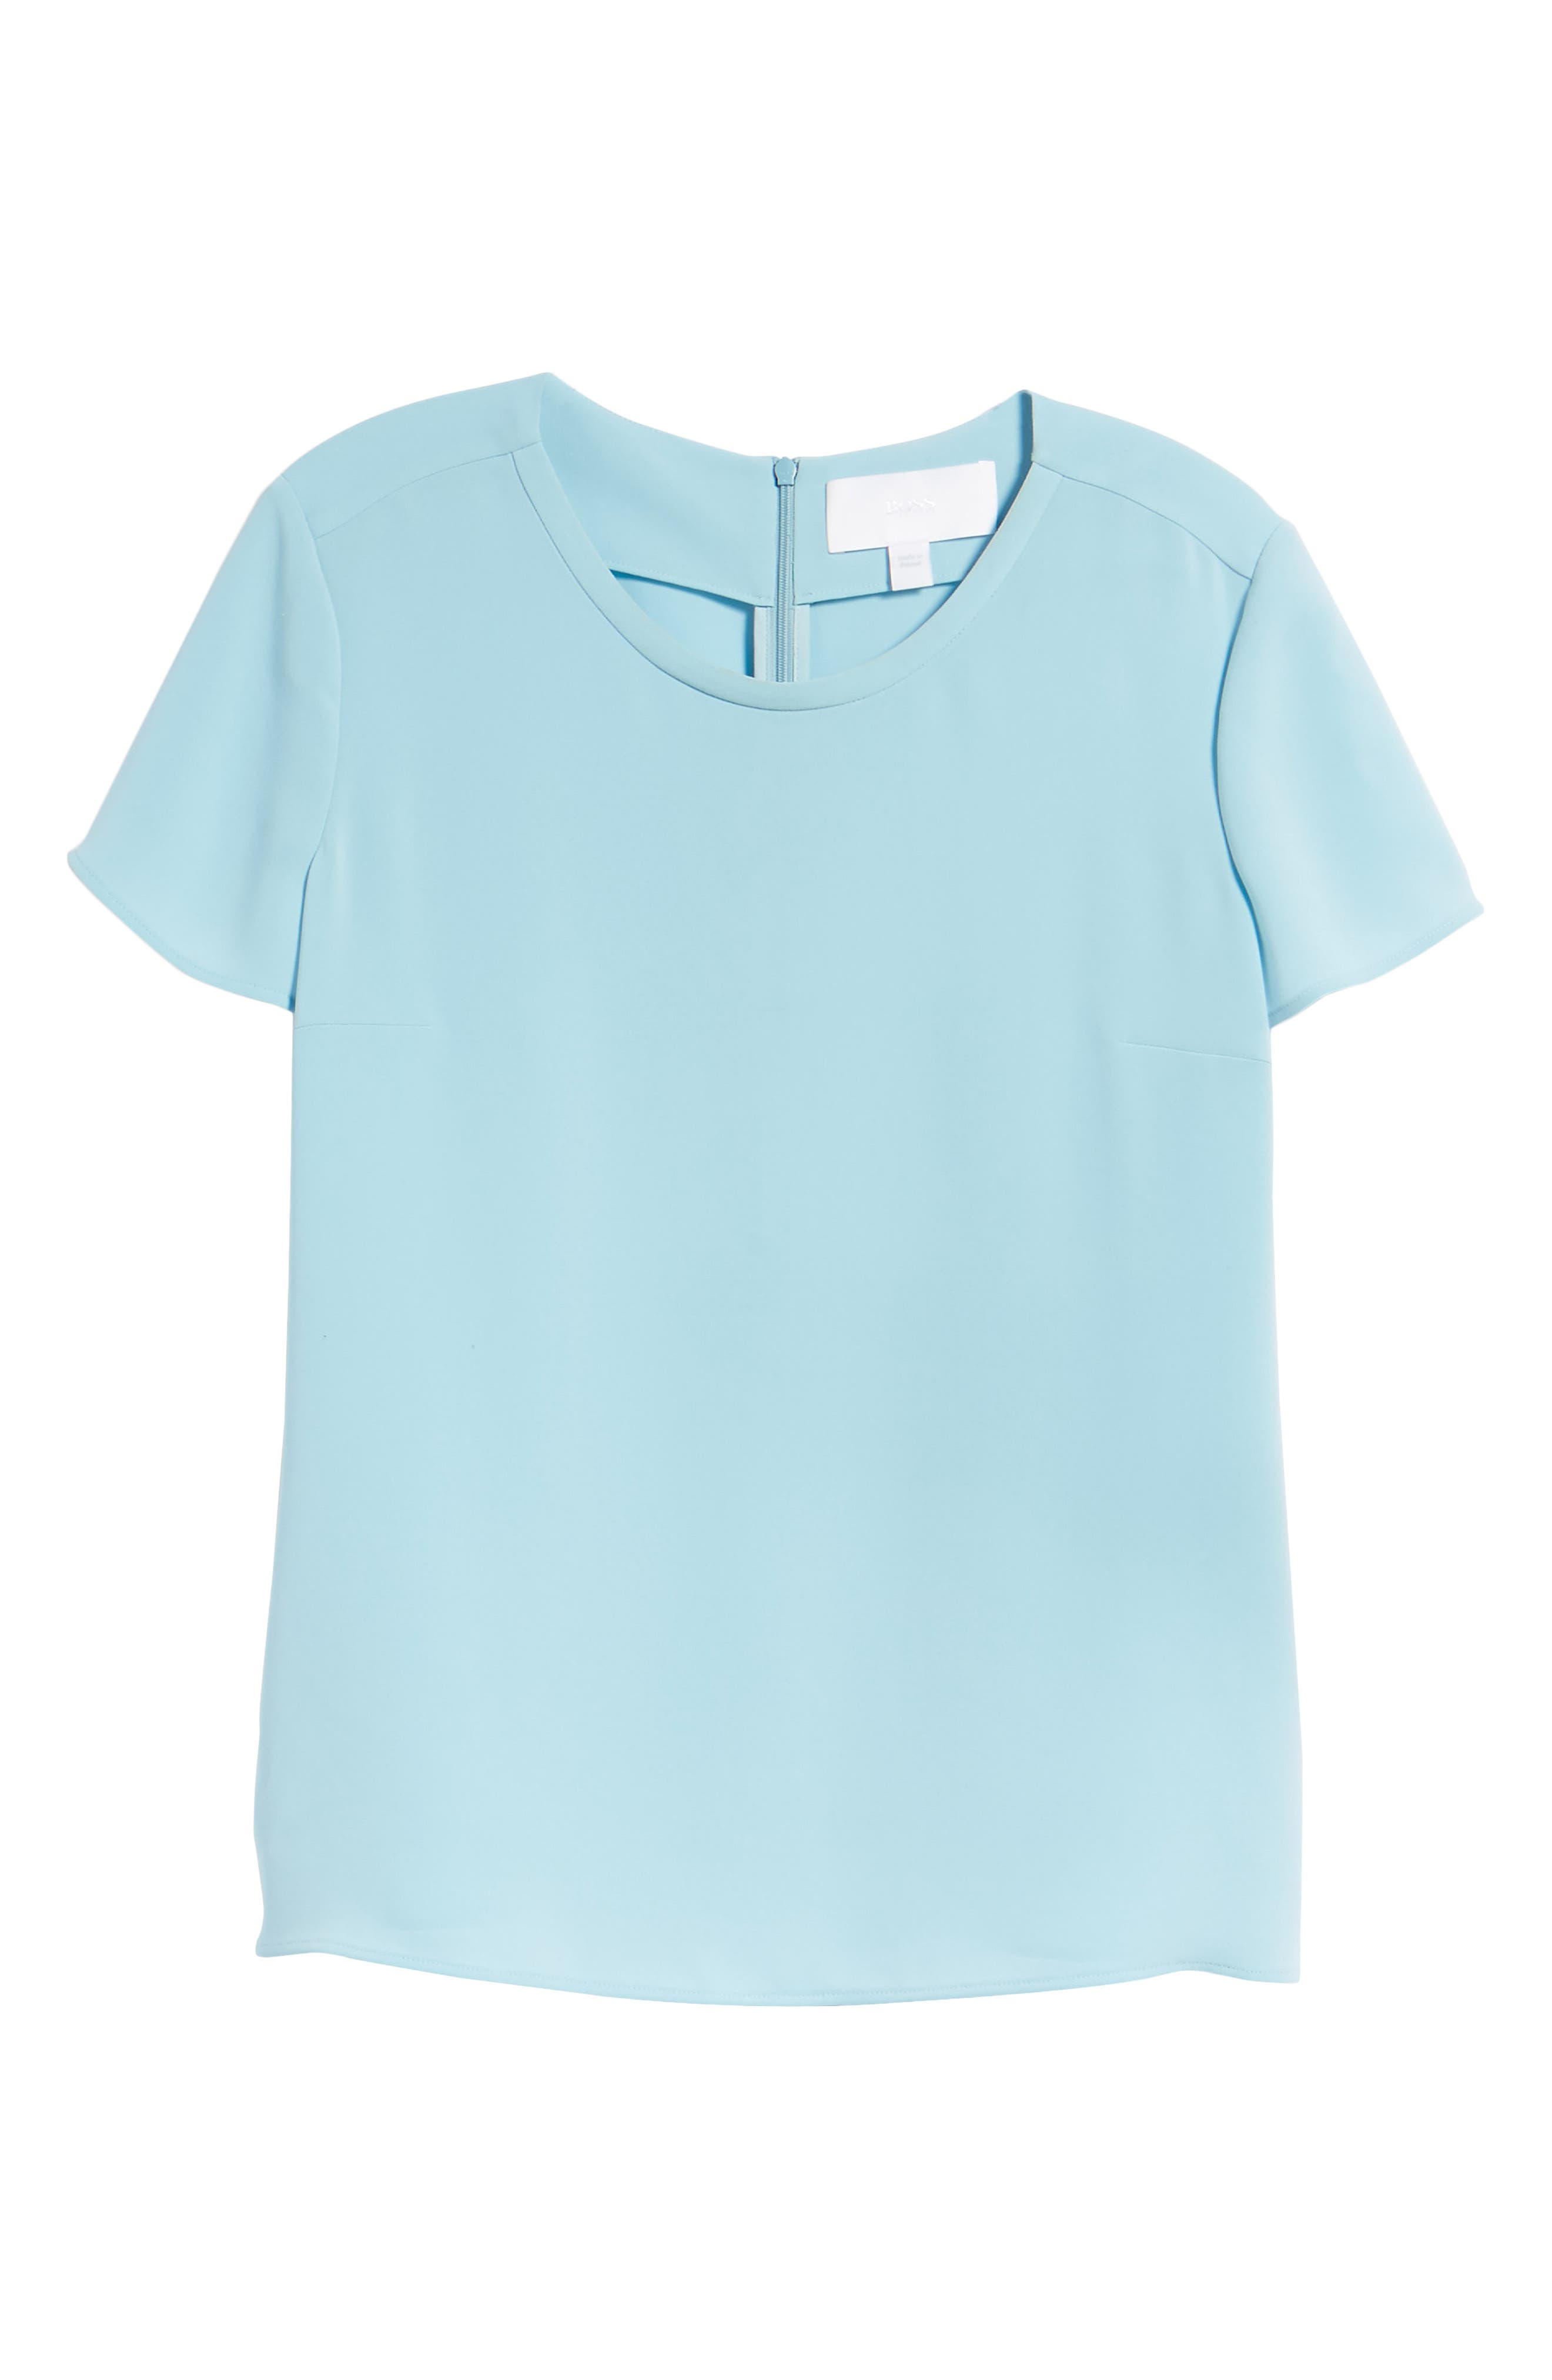 Ilyna Crepe Short Sleeve Top,                             Alternate thumbnail 7, color,                             Lagoon Blue